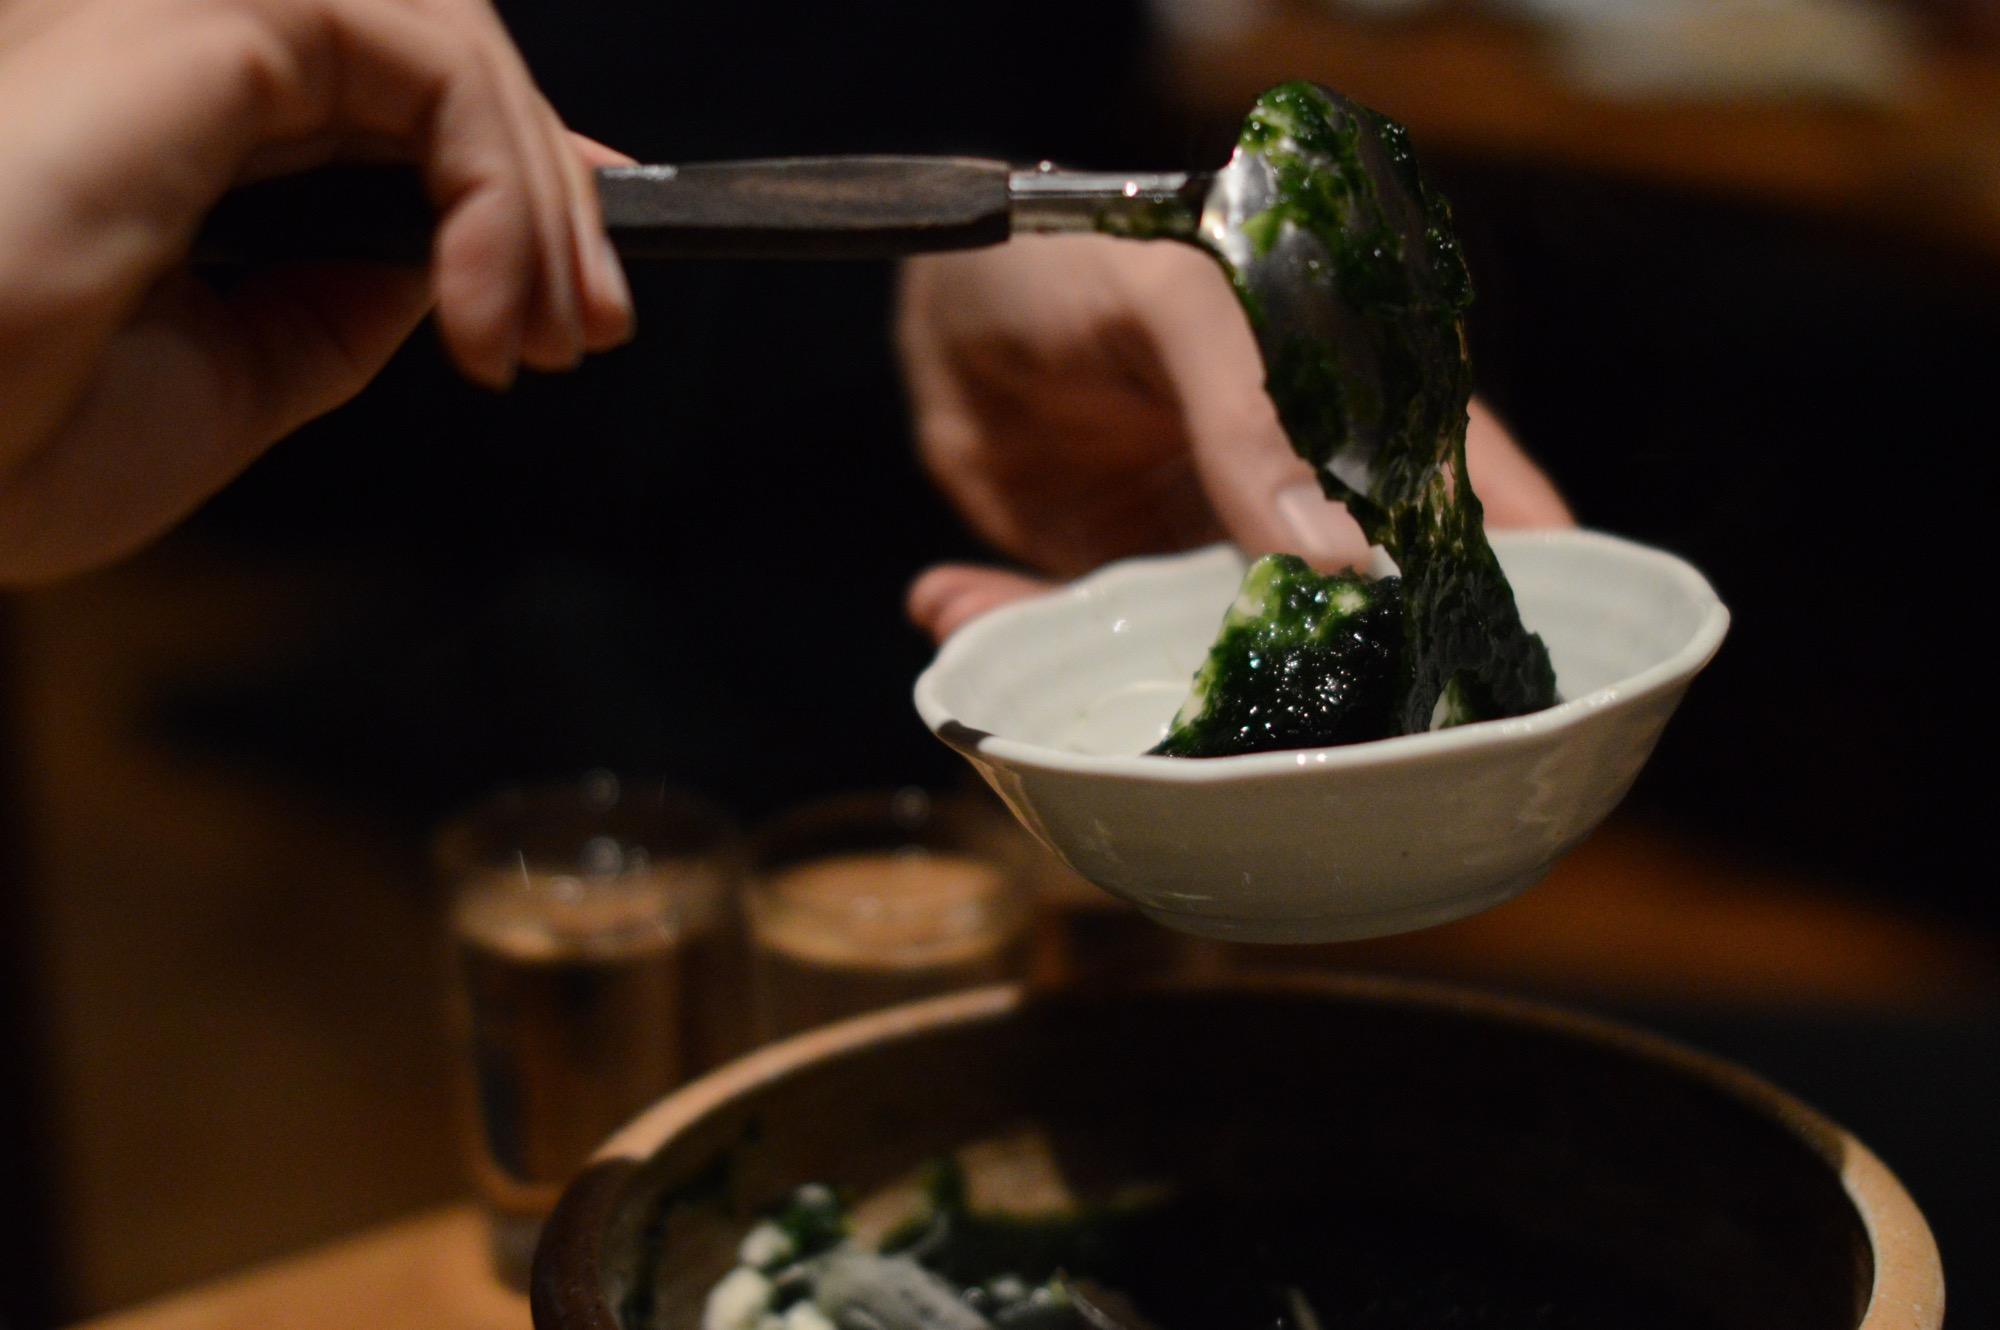 Aonori Dofu, Tofu soaked in green laver soup served